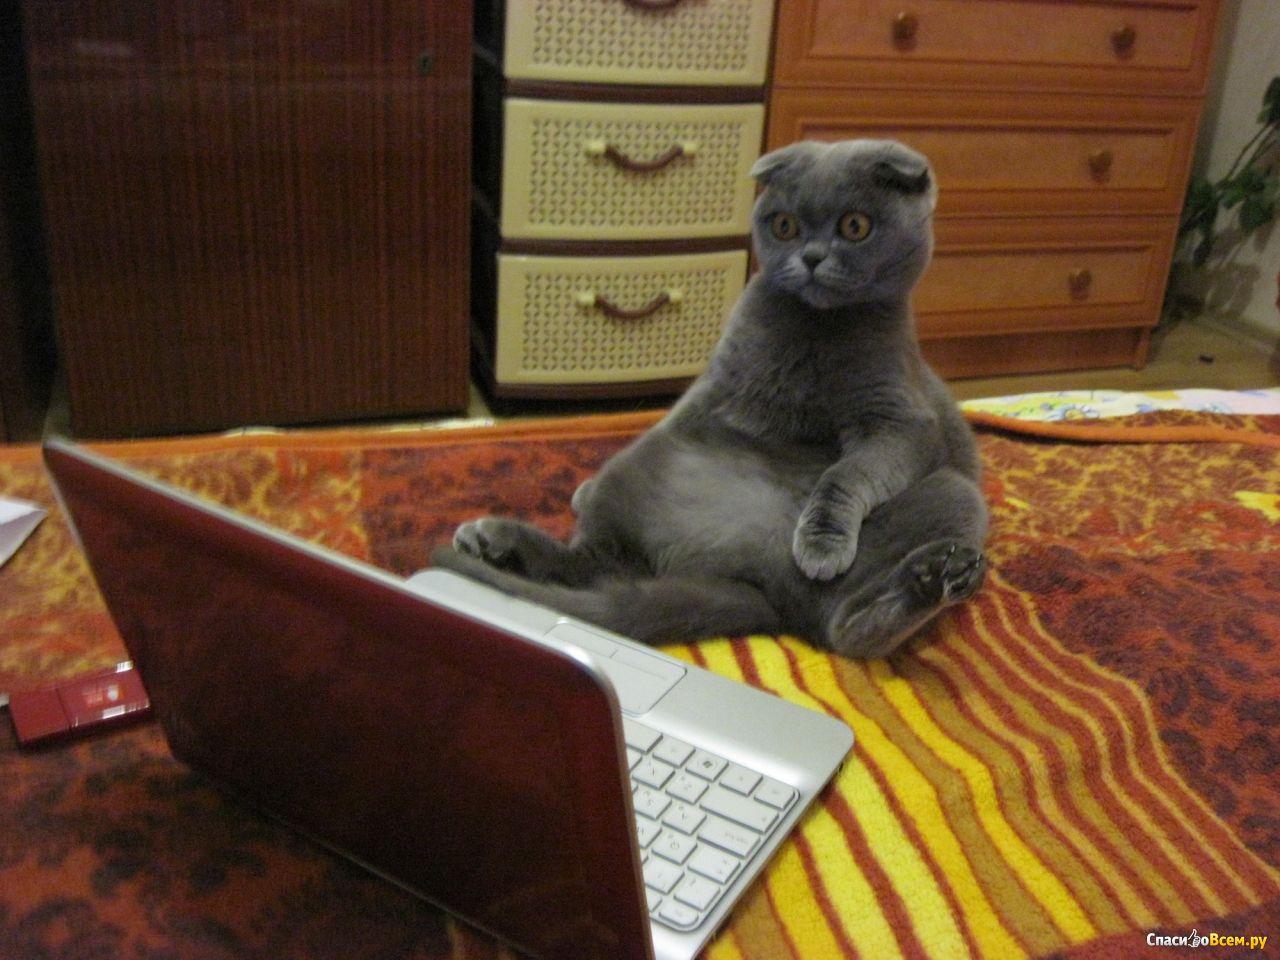 Фото как сидит шотландский кот